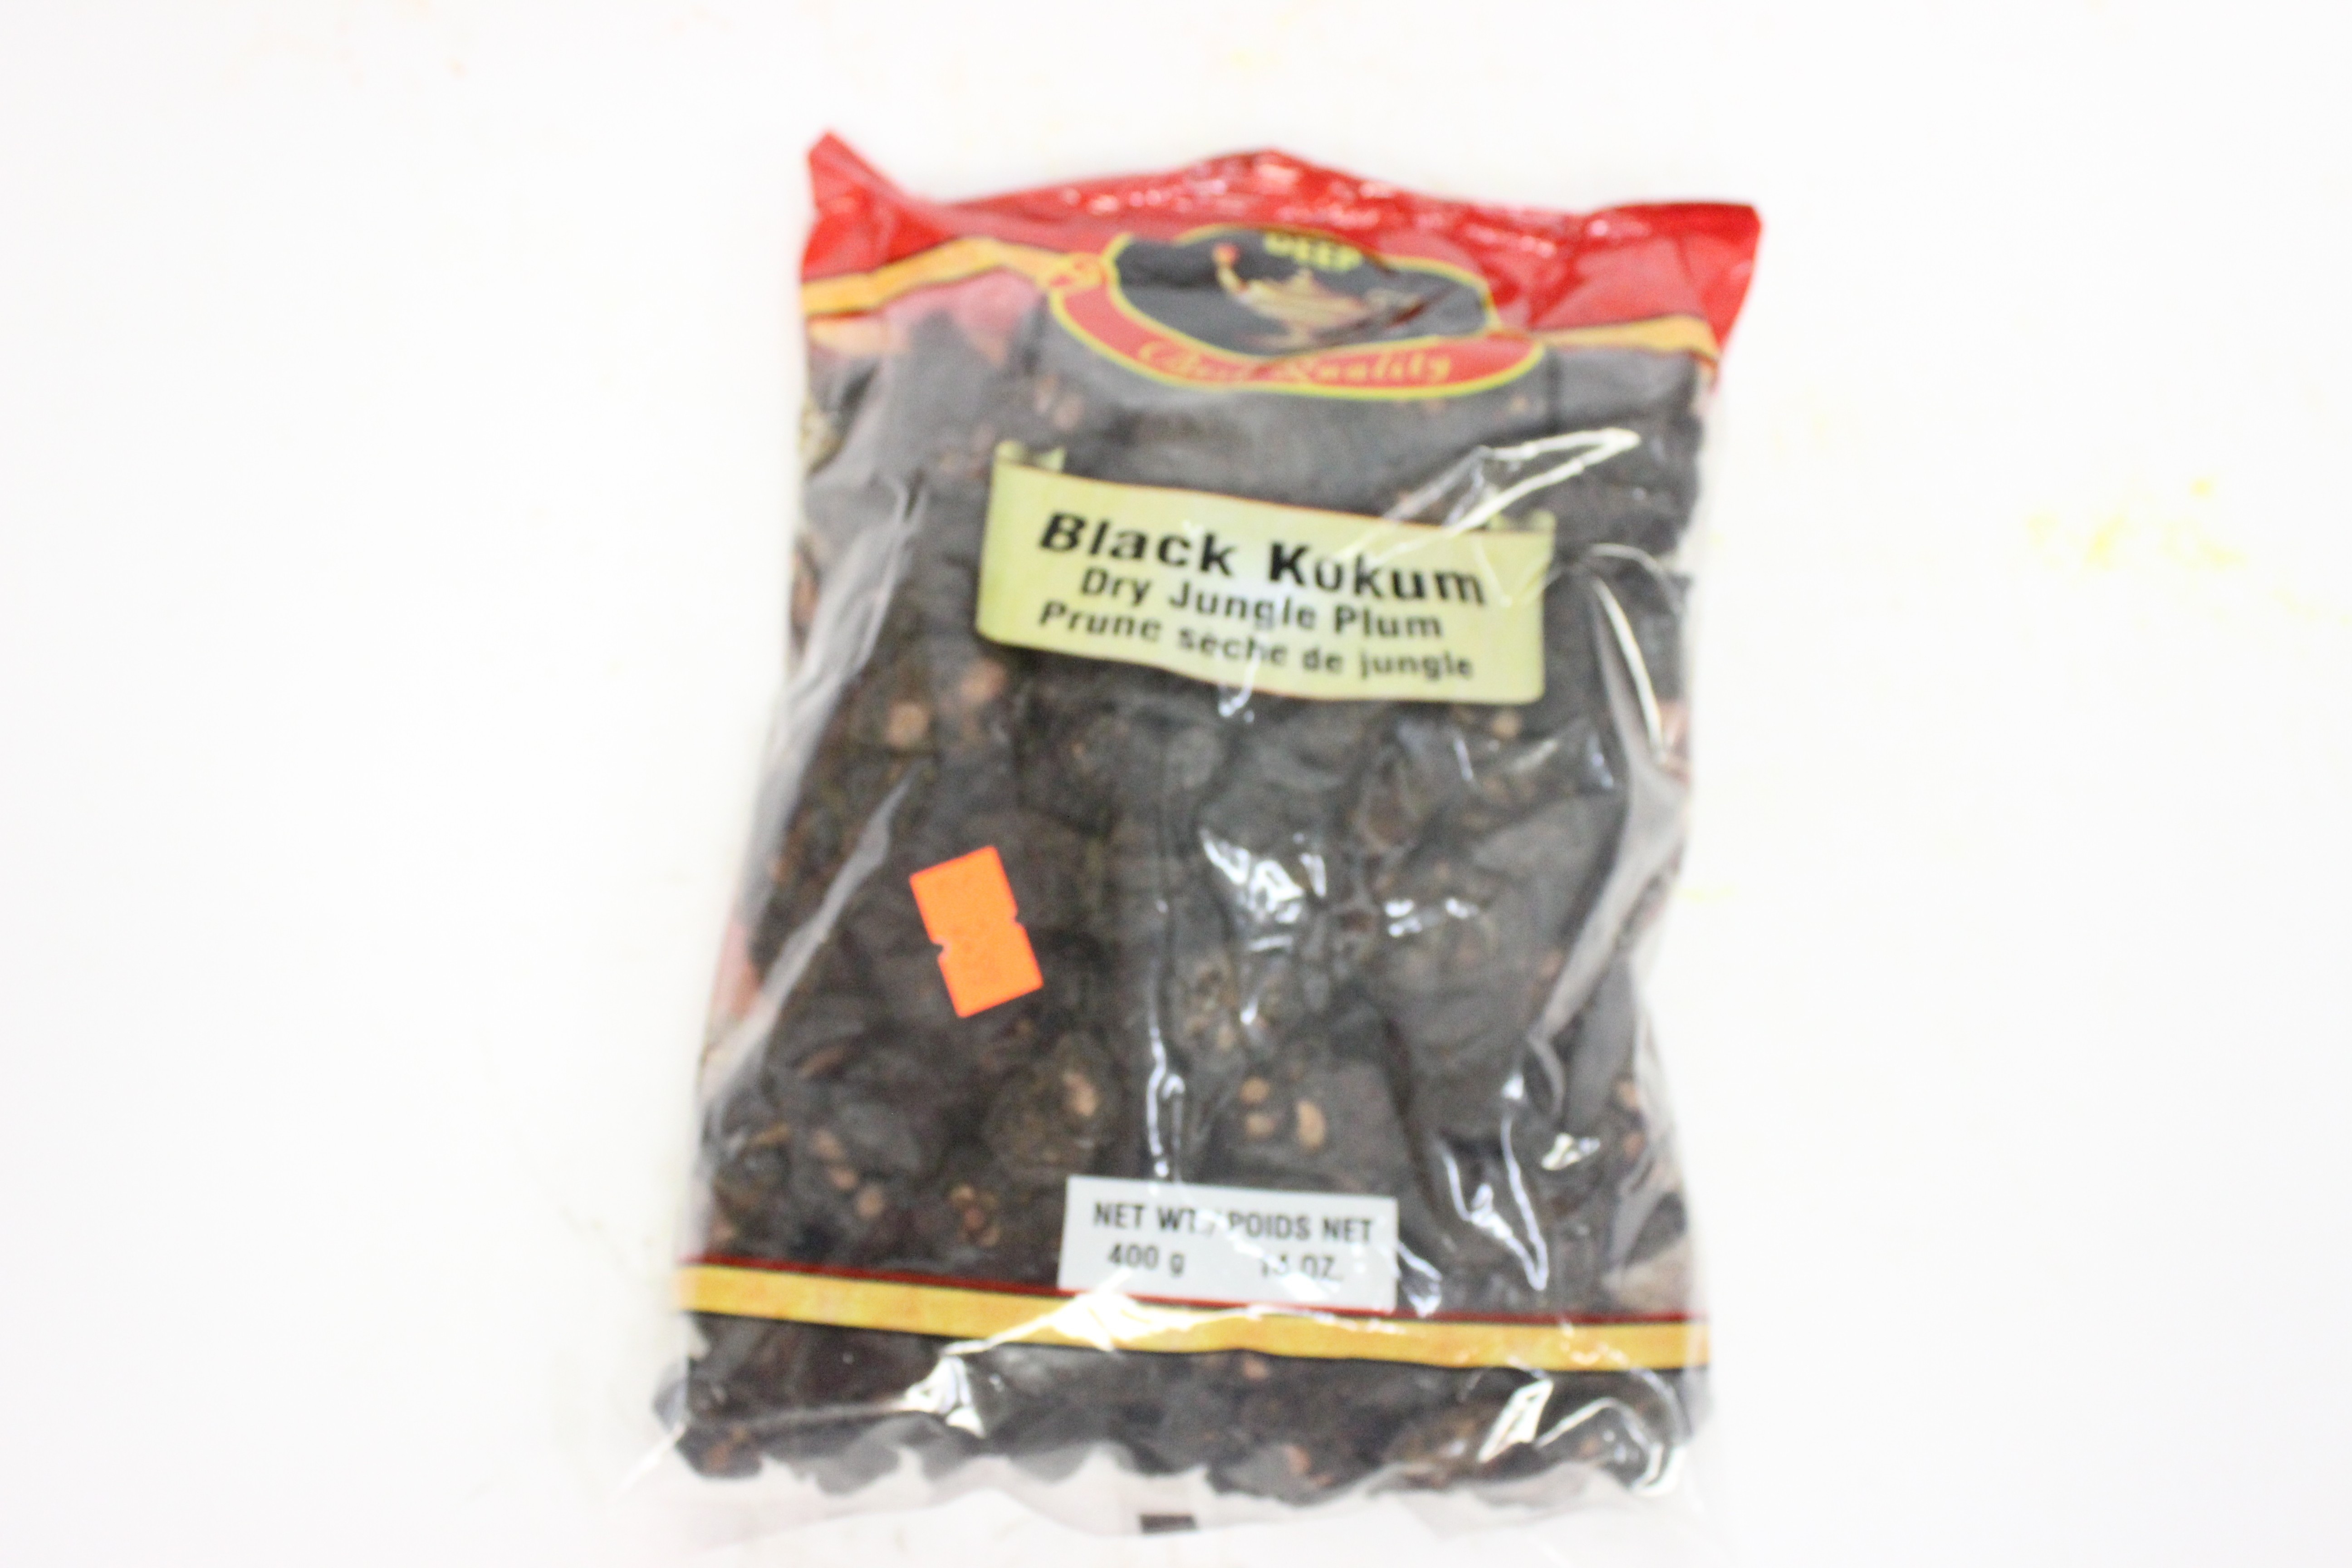 Kokum Black Wet 14.0 oz